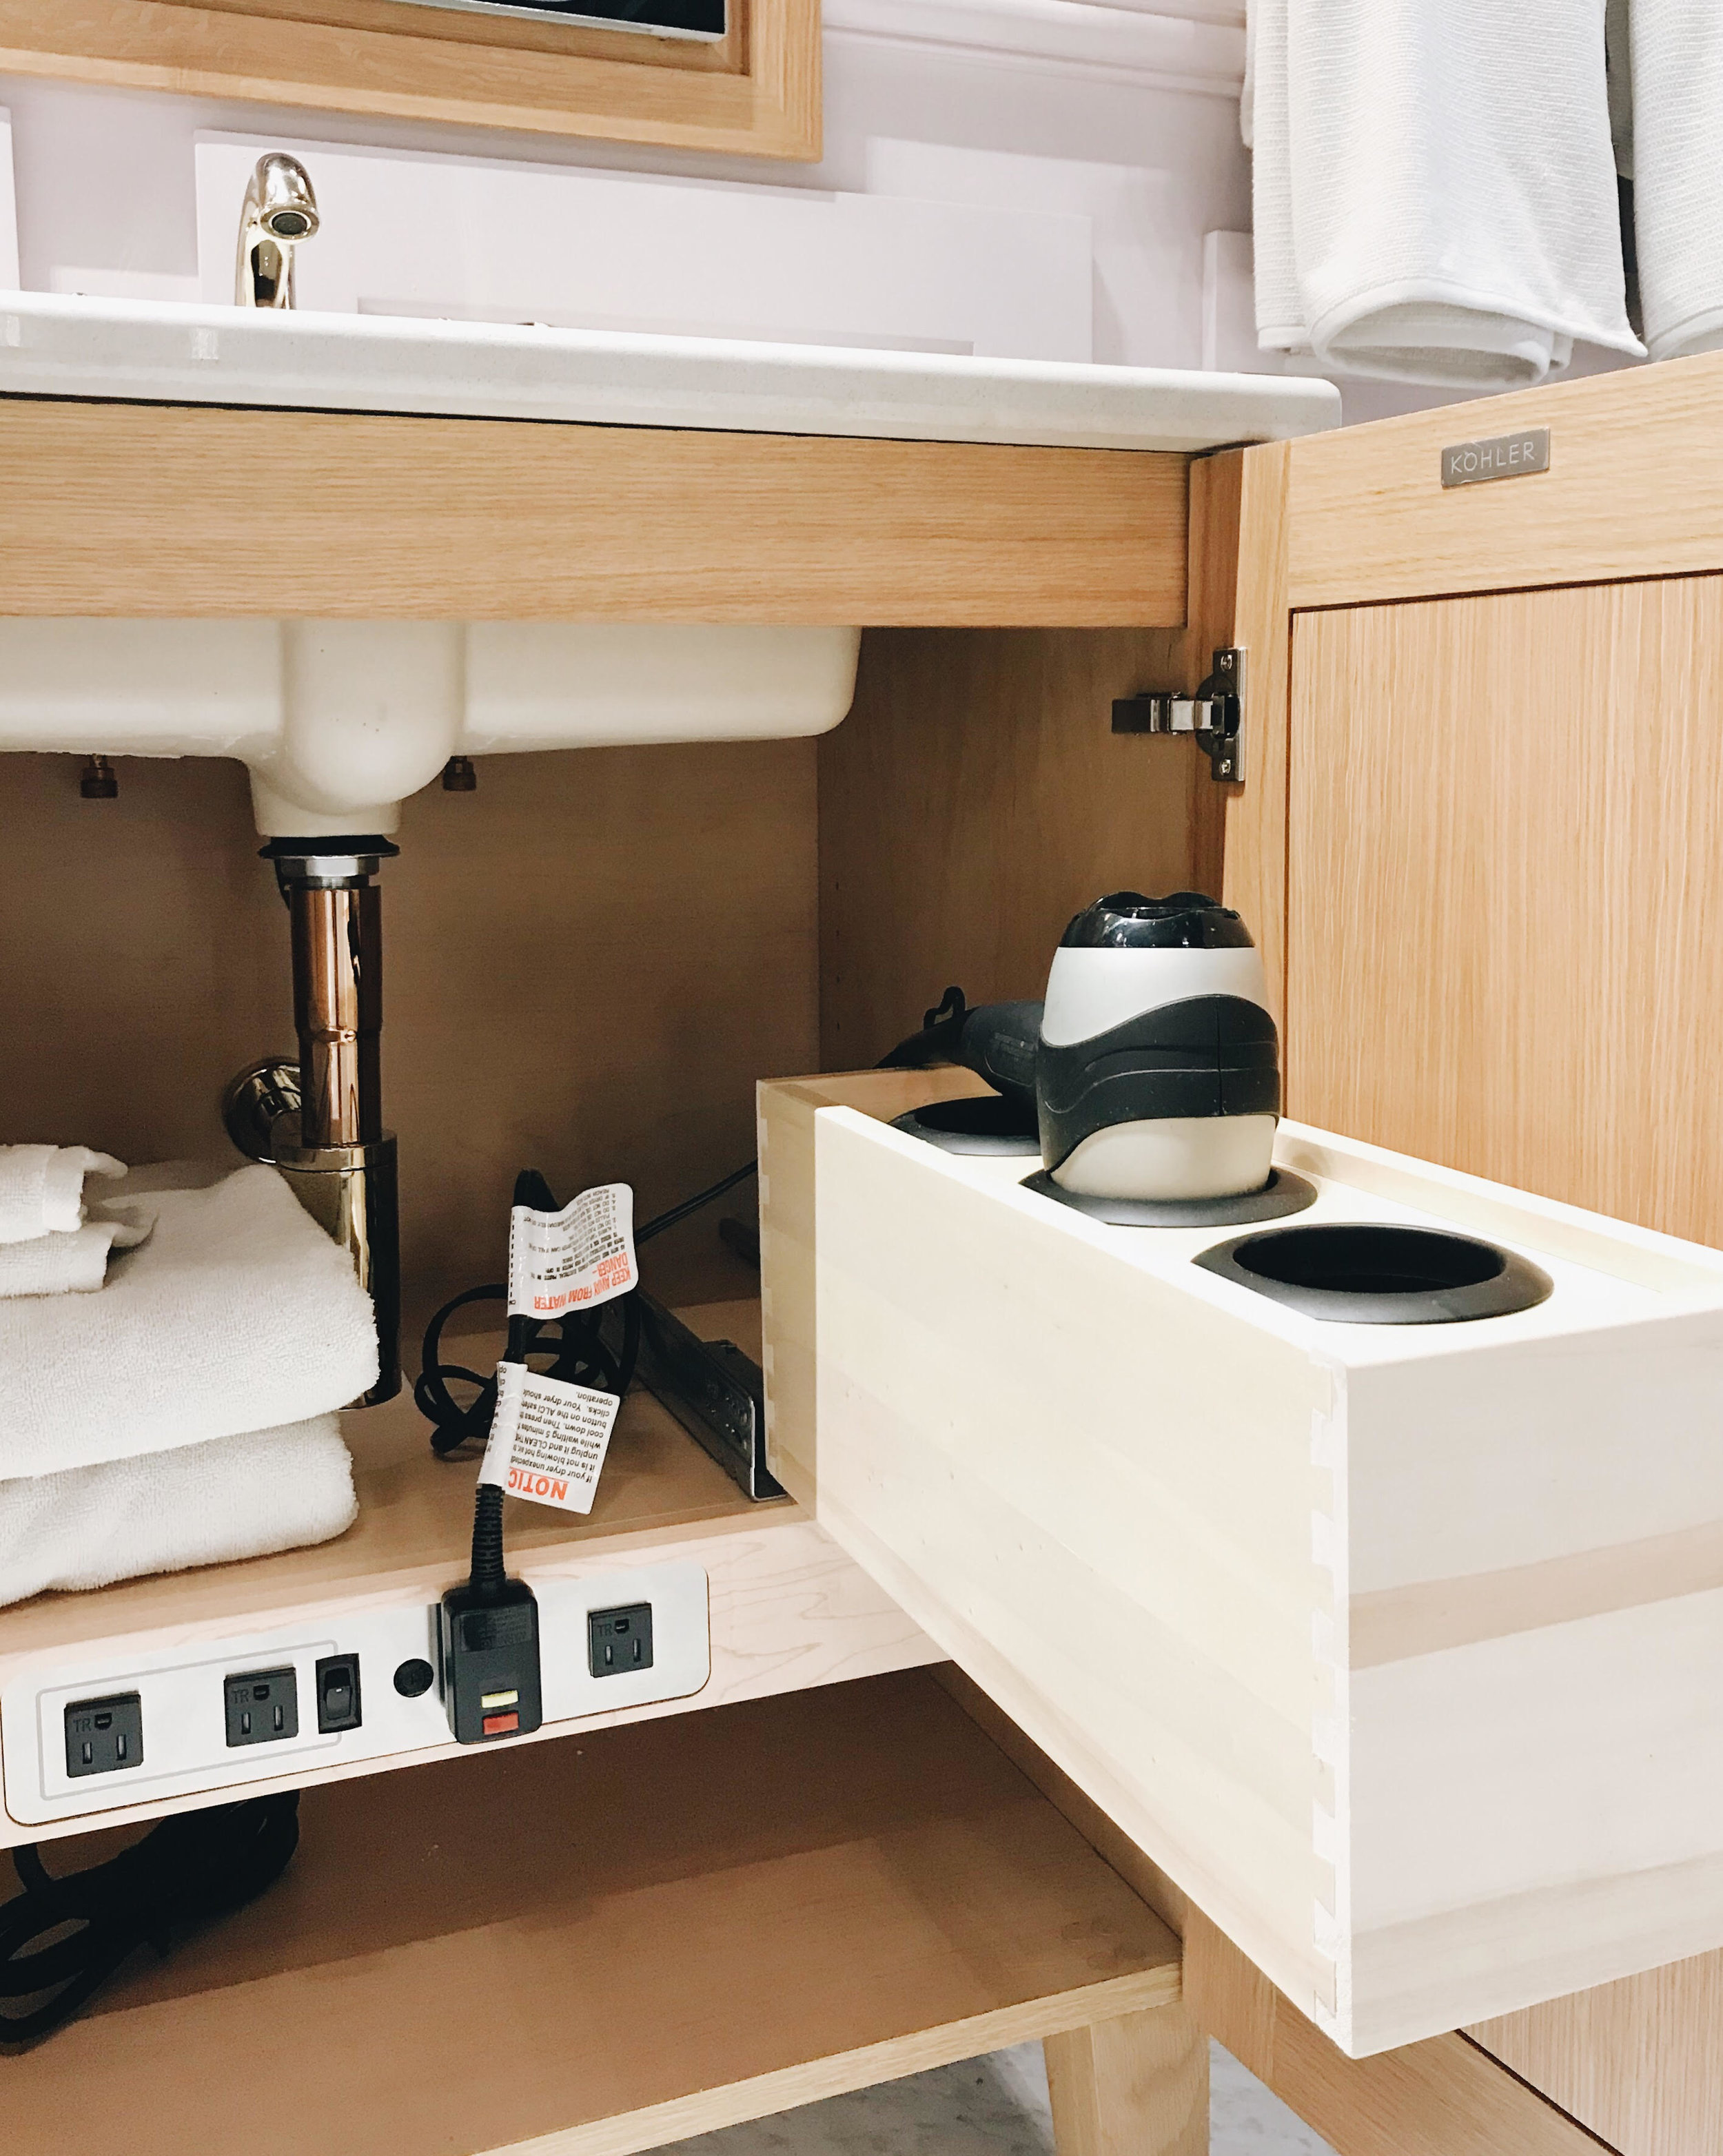 https://www.us.kohler.com/us/Intelligent-Toilets-and-Cleansing-Seats/article/CNT121600001.htm